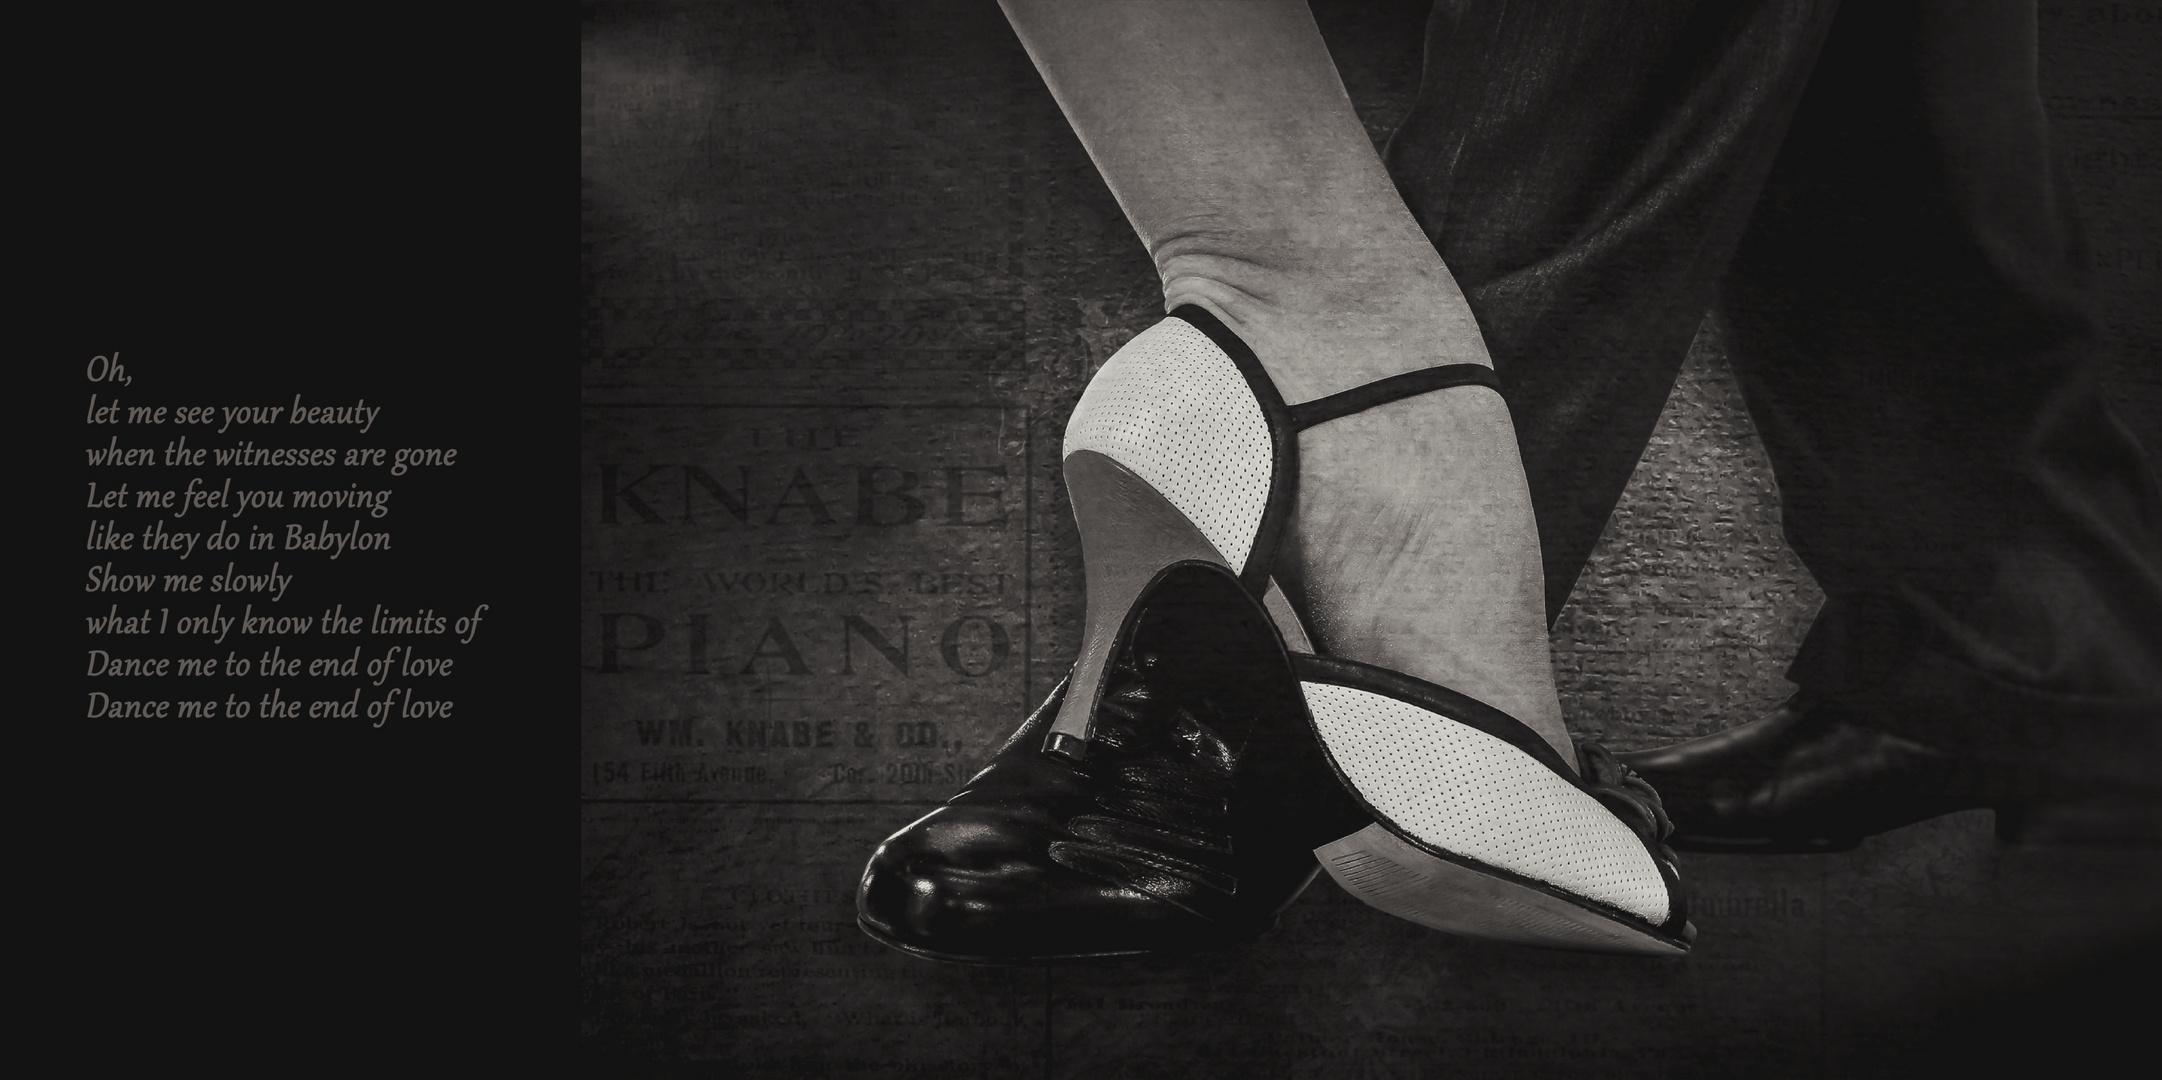 Dance me...